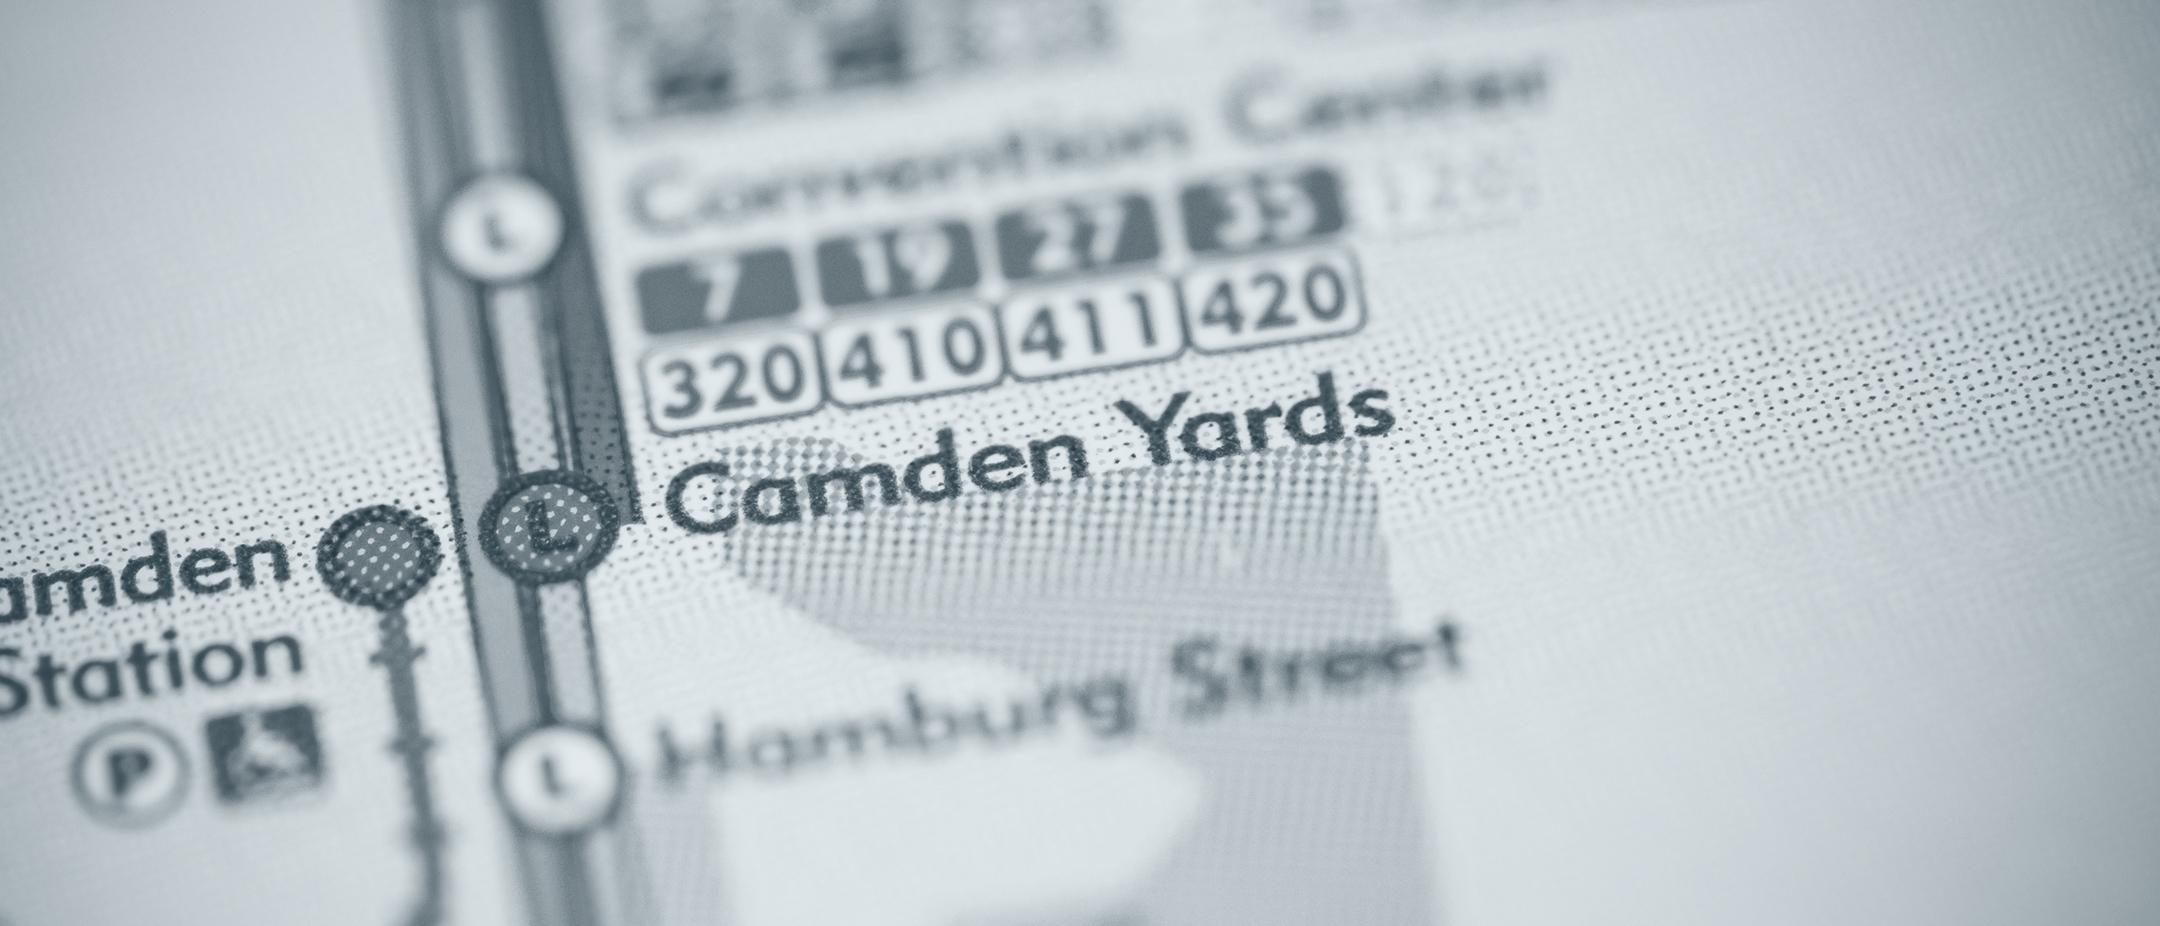 camden-map-edit-wide